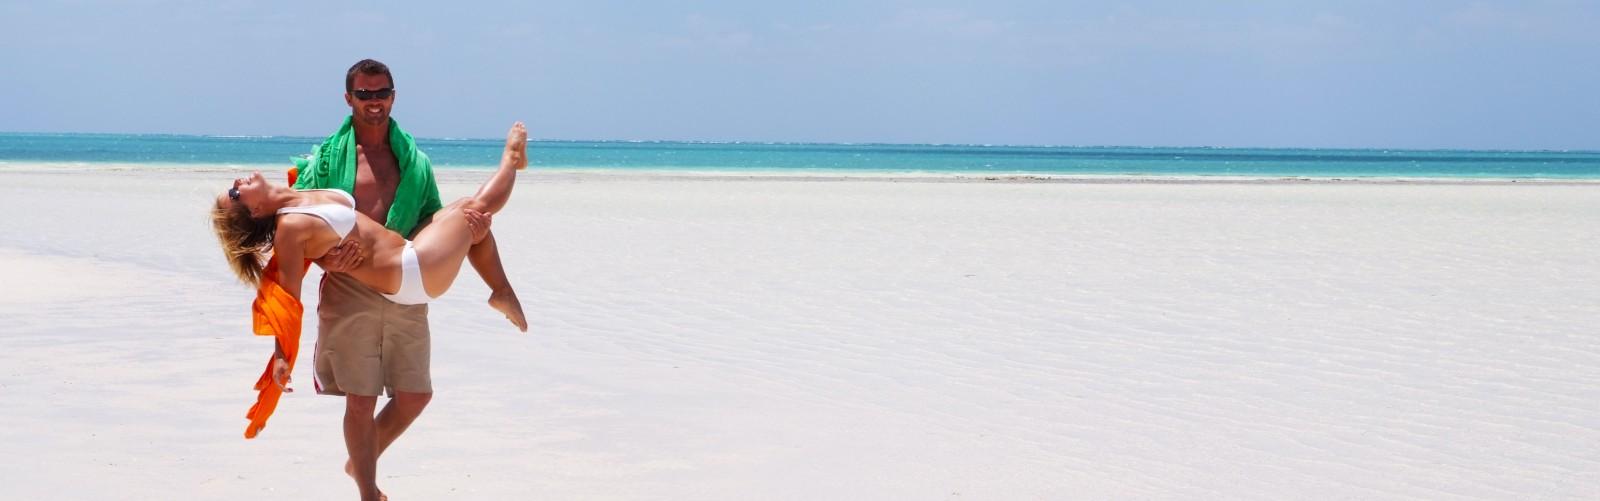 romantic getaways: grand bahama island vacations